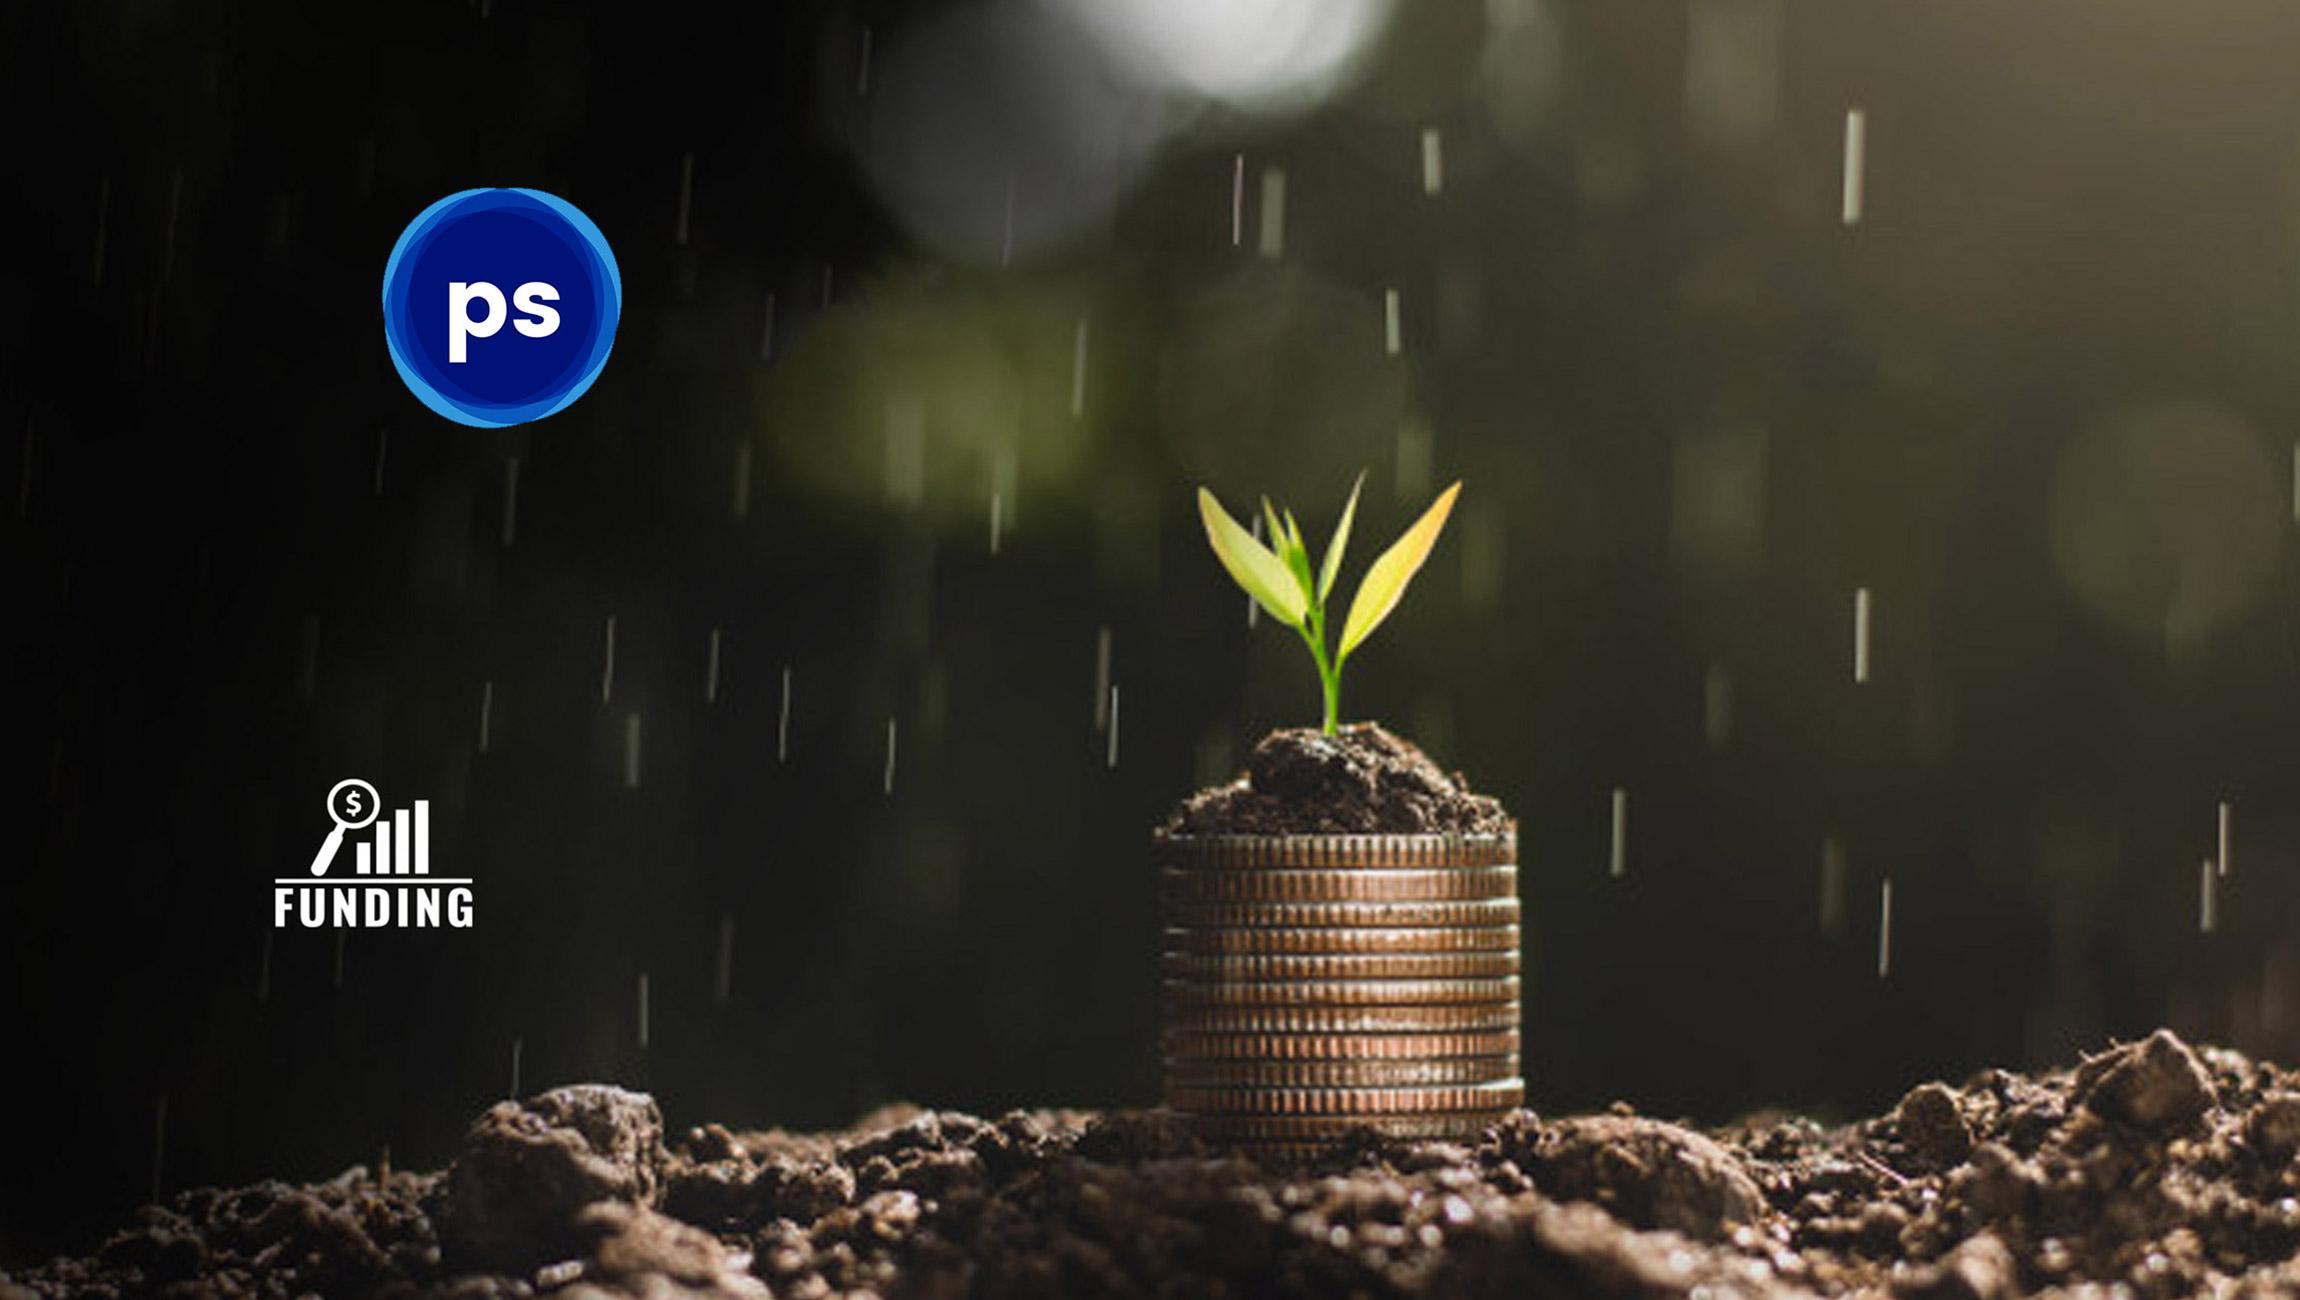 SMS Marketing Firm Postscript Raises $4.5 Million Funds